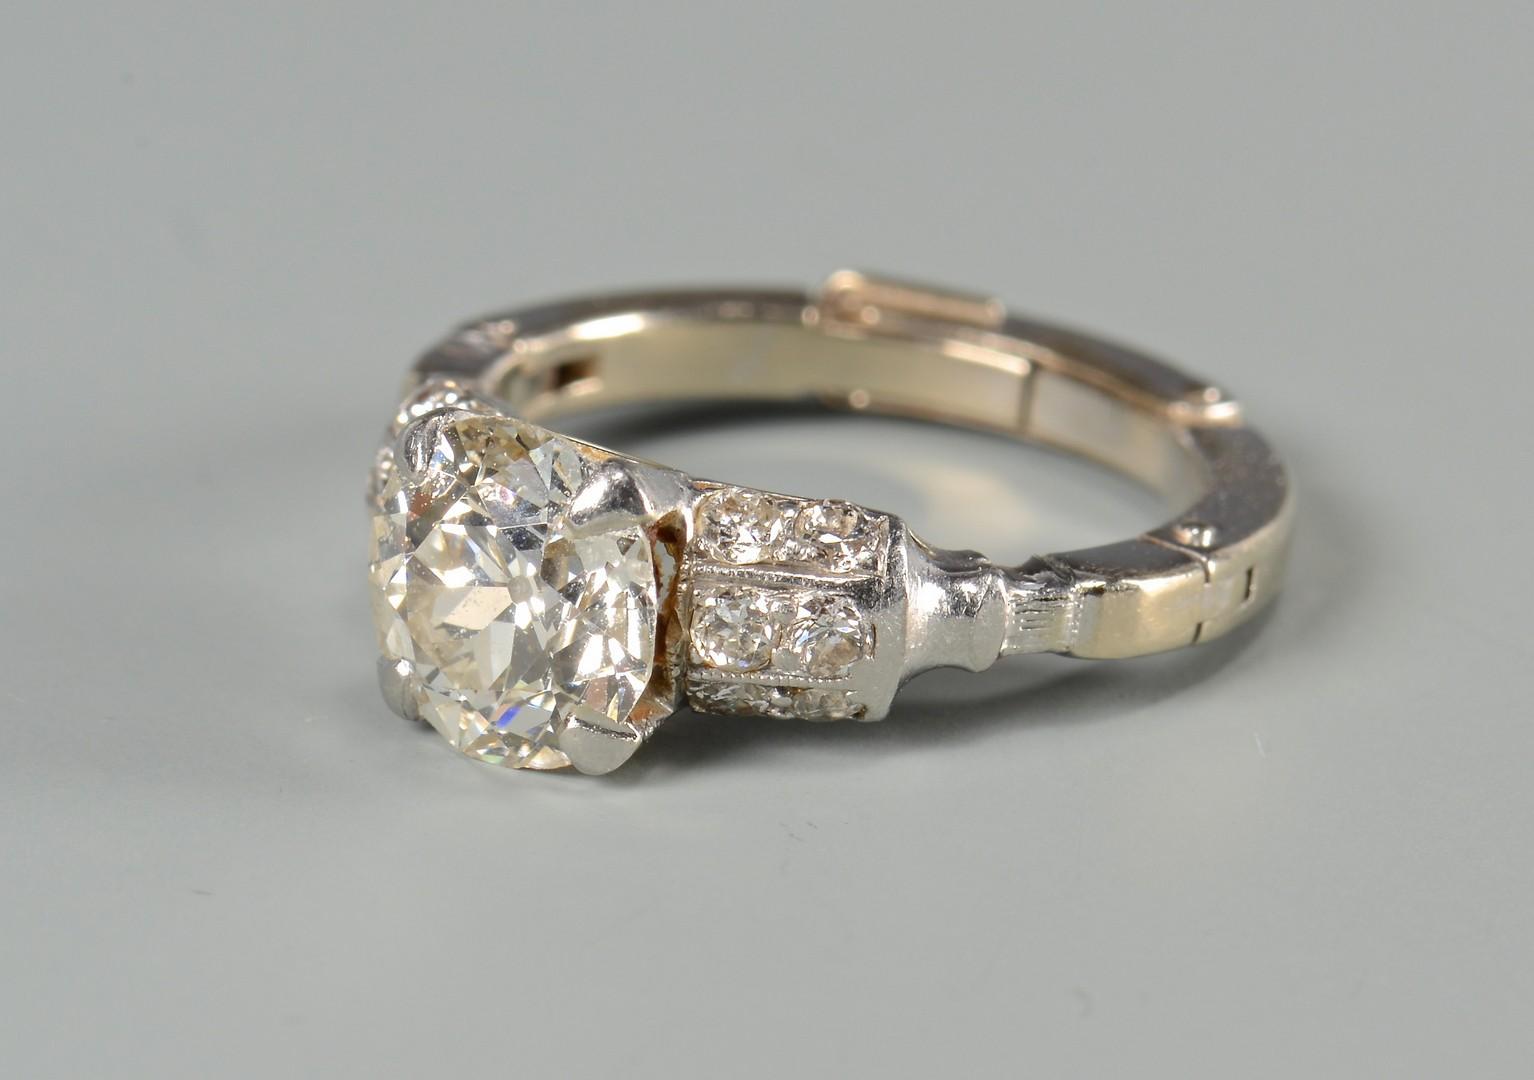 Lot 397: 1.35 carat old mine cut diamond ring